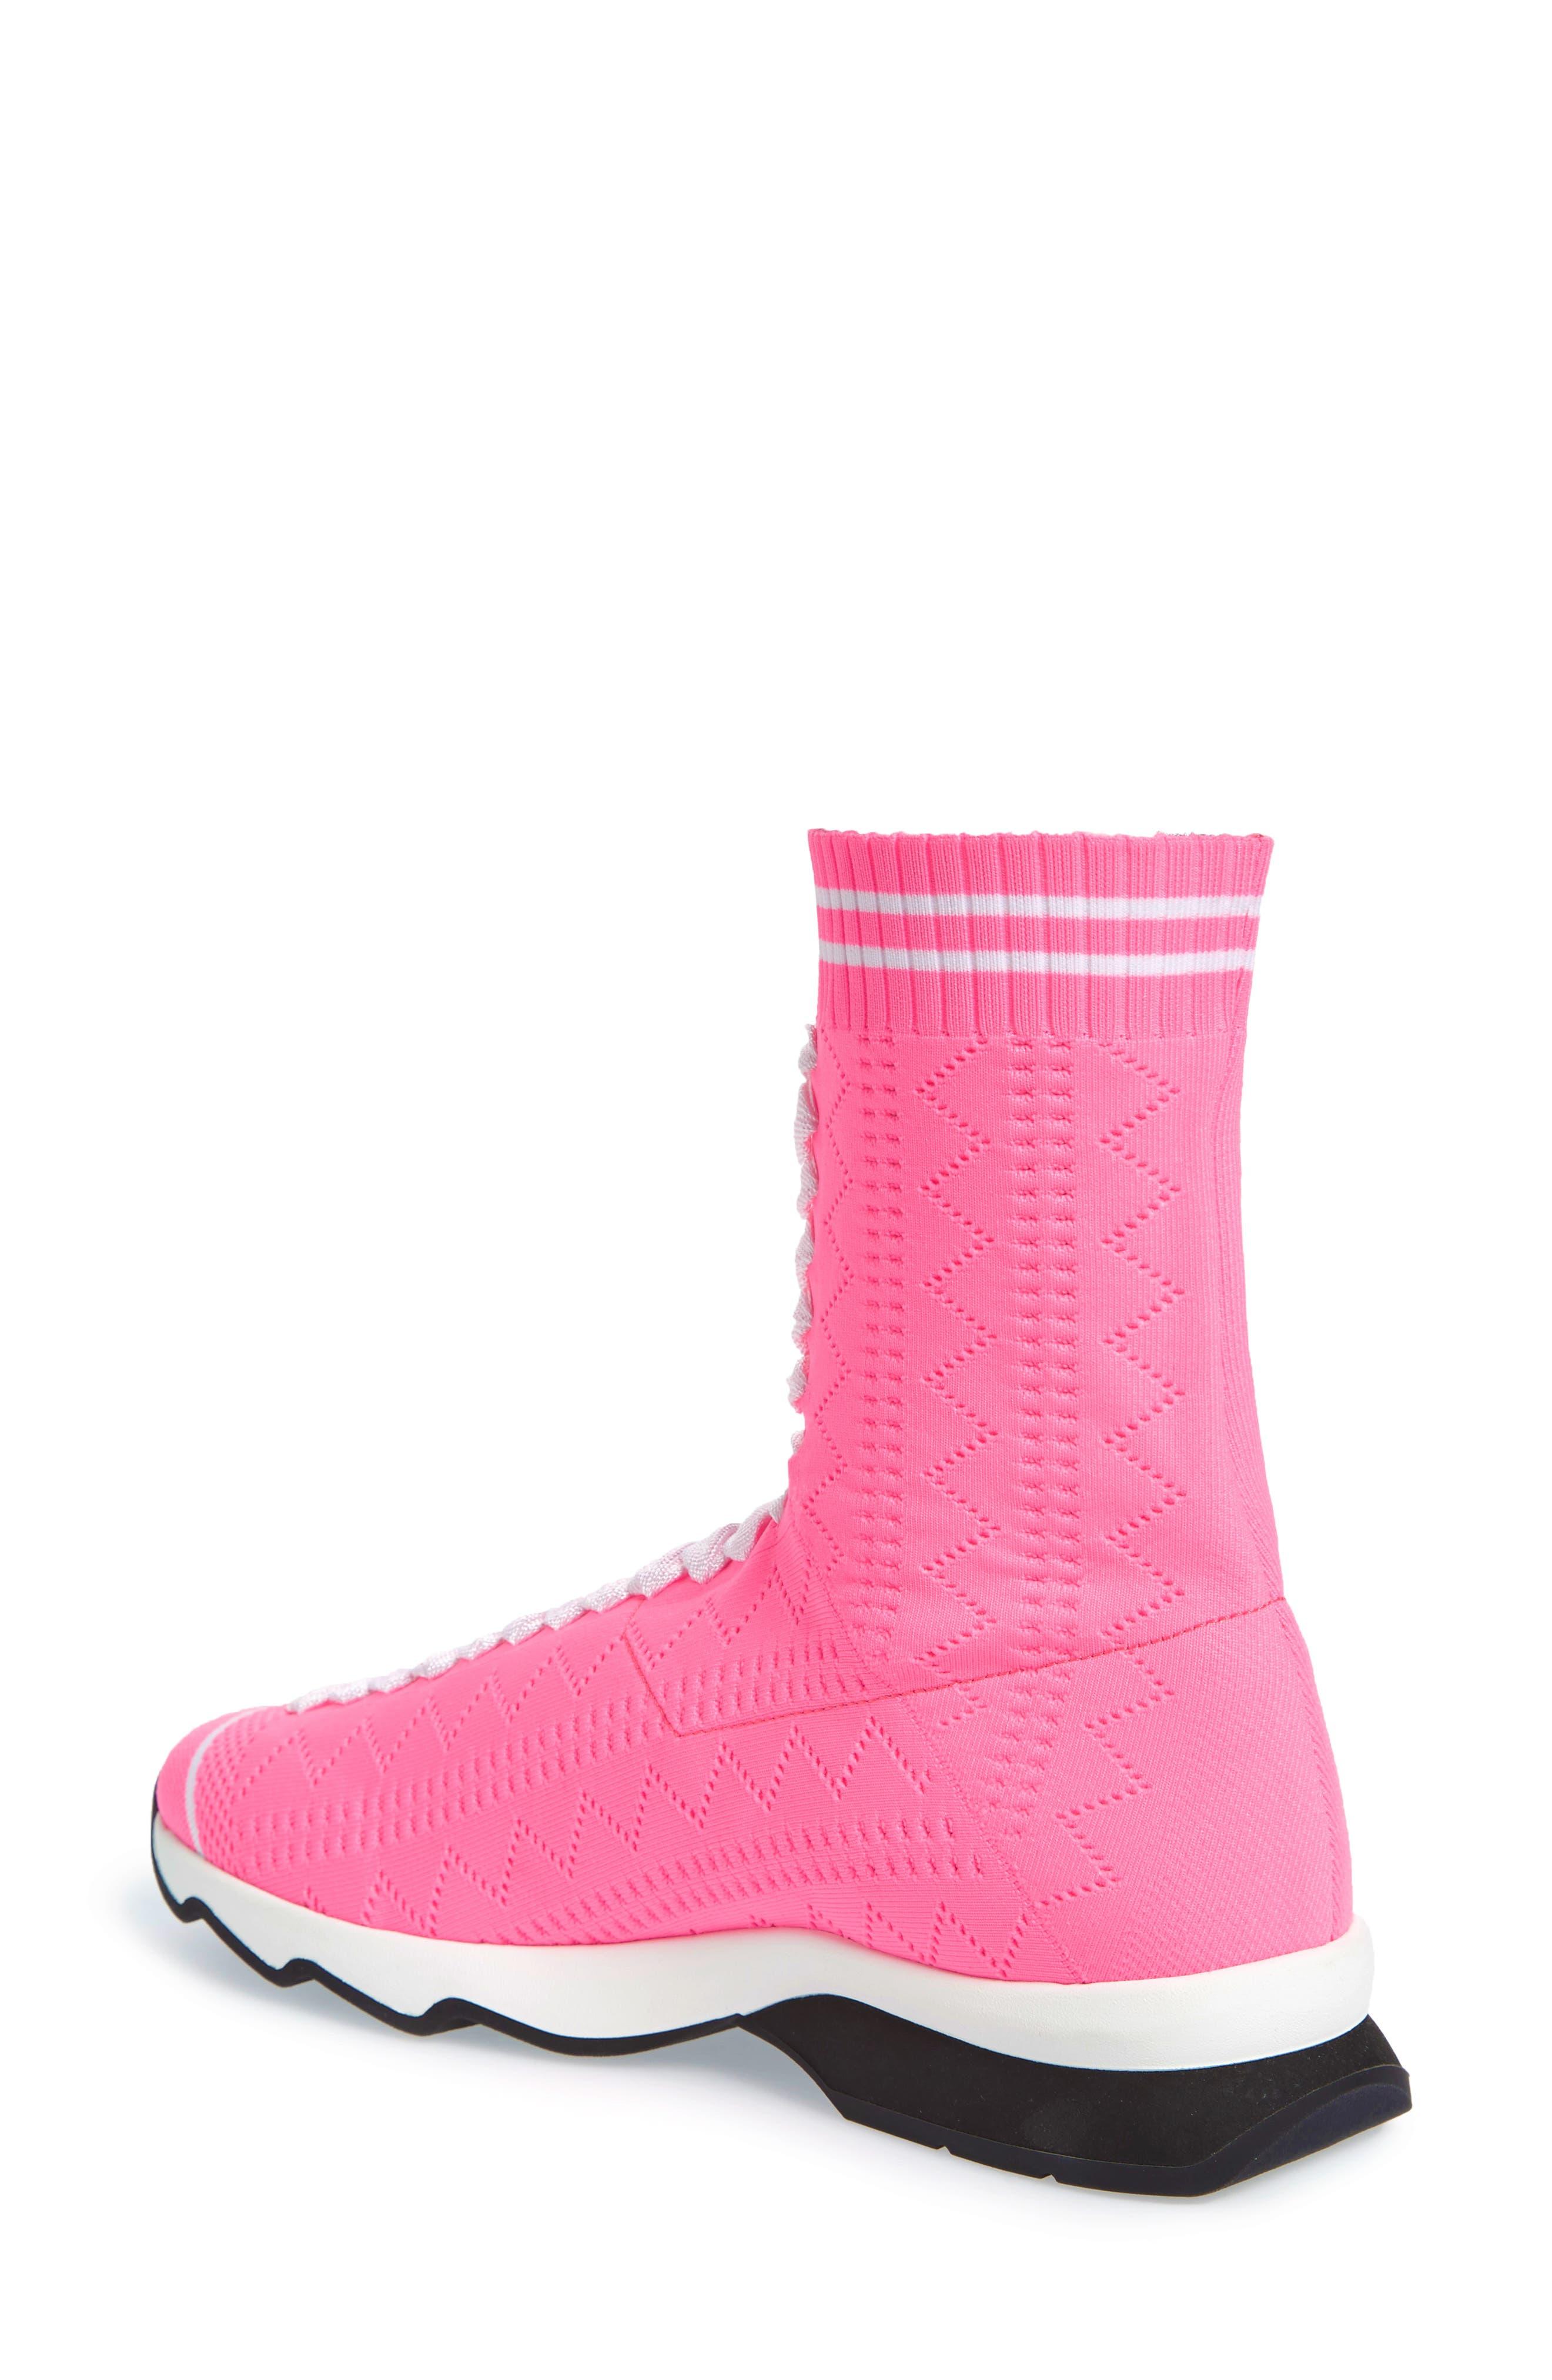 Rocko-Top Sock Sneaker,                             Alternate thumbnail 2, color,                             Pink